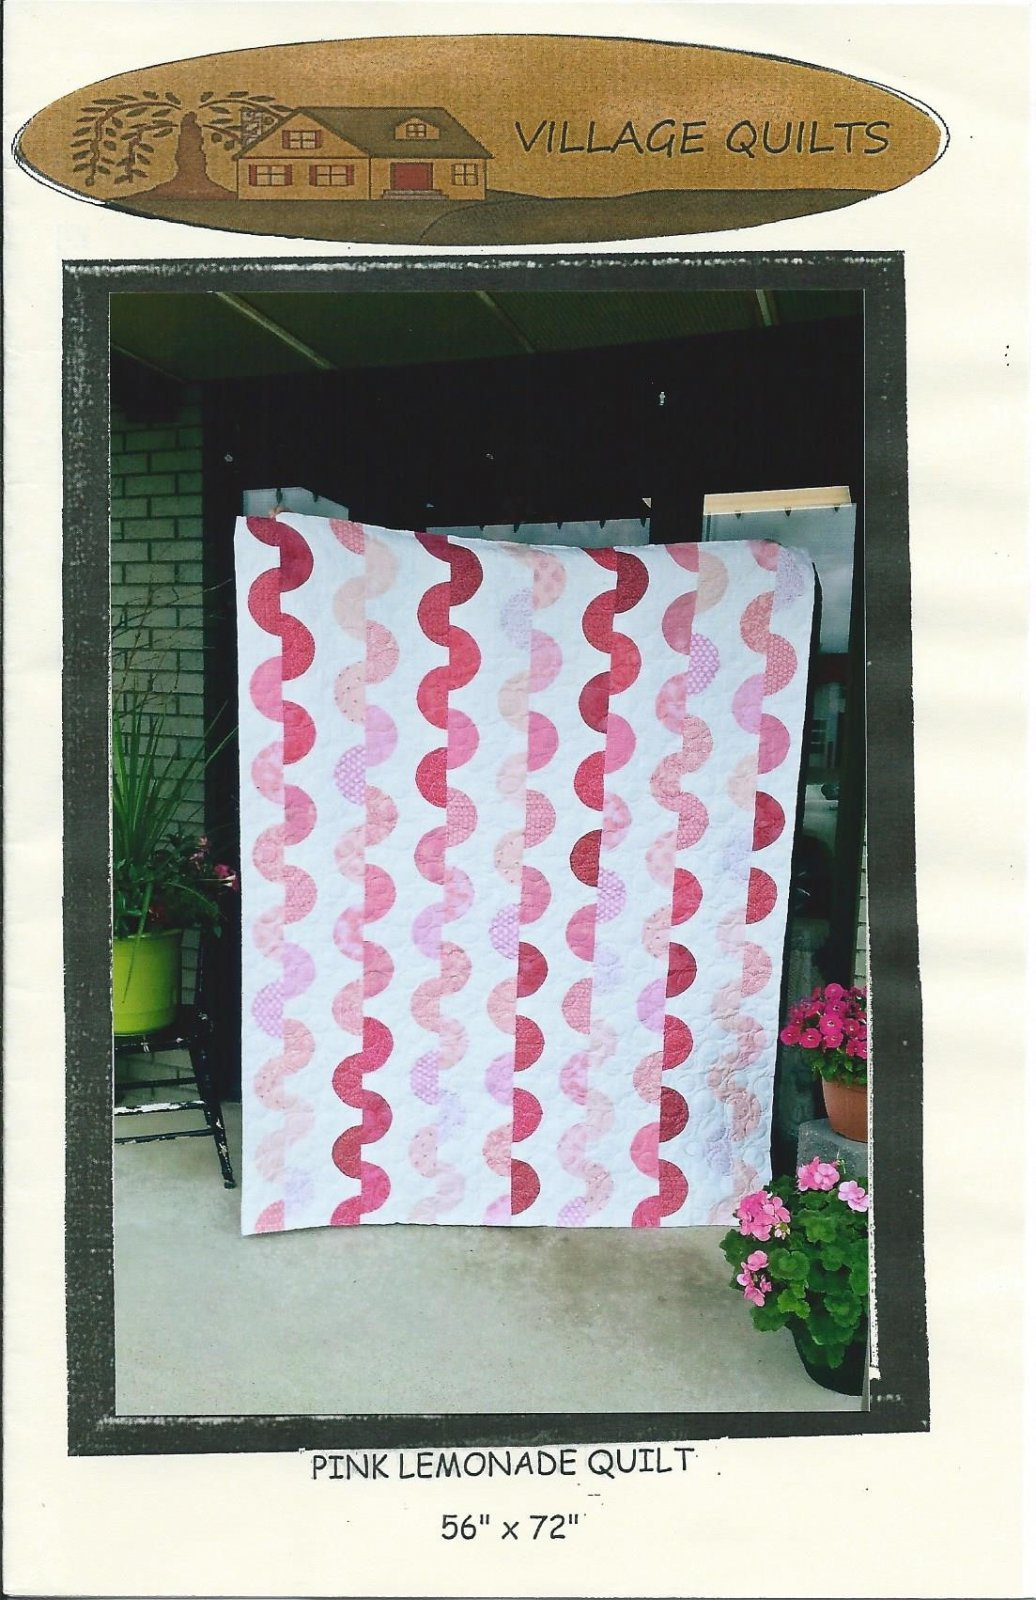 Pink Lemonade Quilt pattern